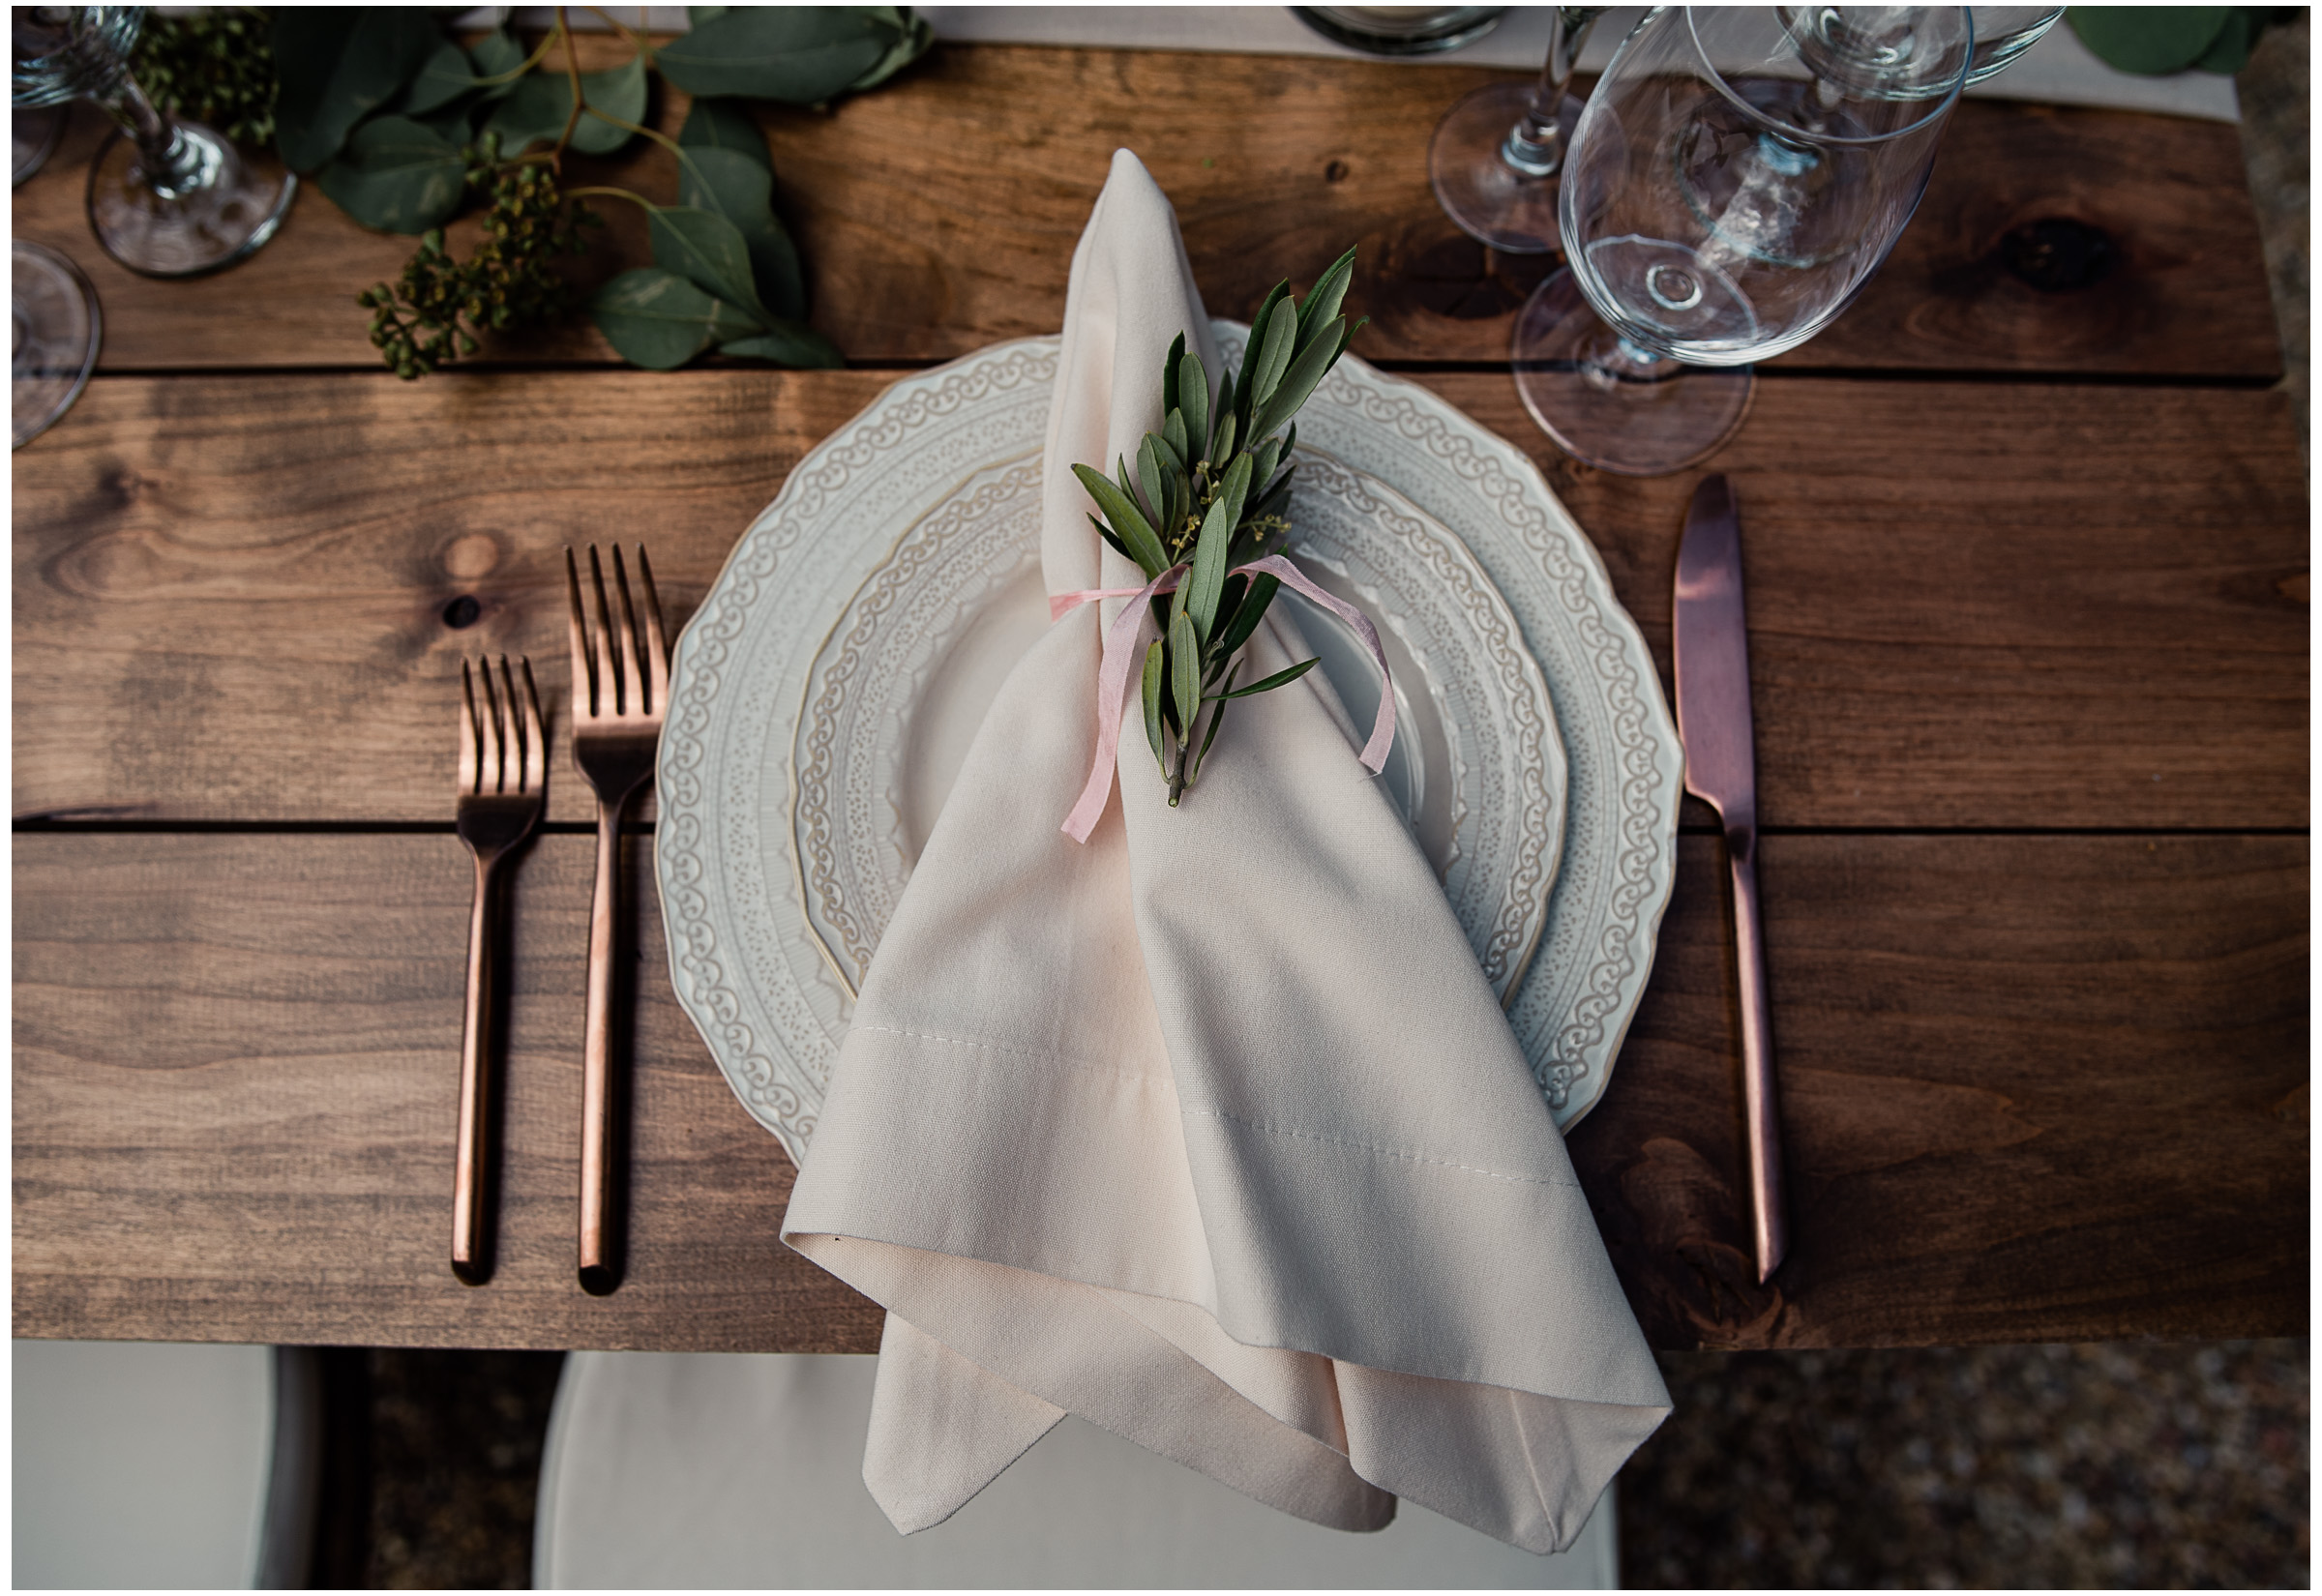 Winters Wedding - Sacramento Photographer - Field & Pond - Justin Wilcox Photography - 21.jpg